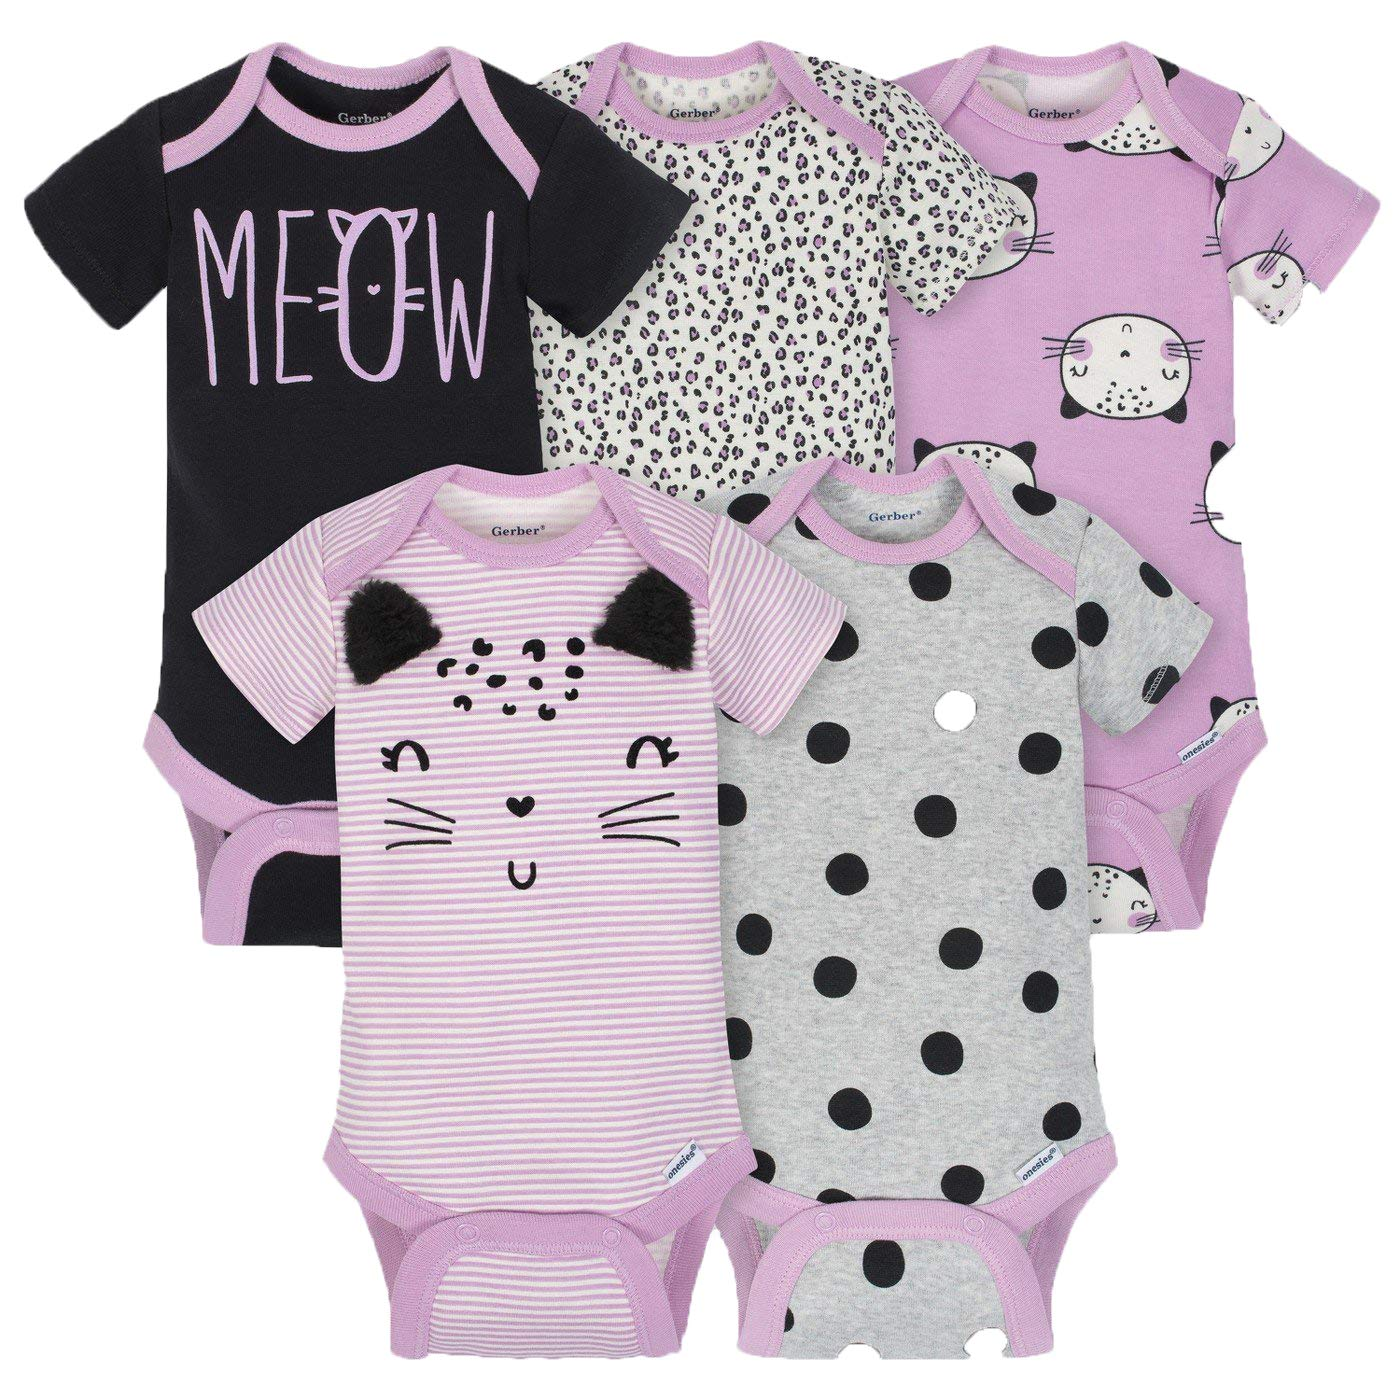 Gerber Girls 5-Pack Onesies Brand Short Sleeve Bodysuits (Newborn, Purple Cats)